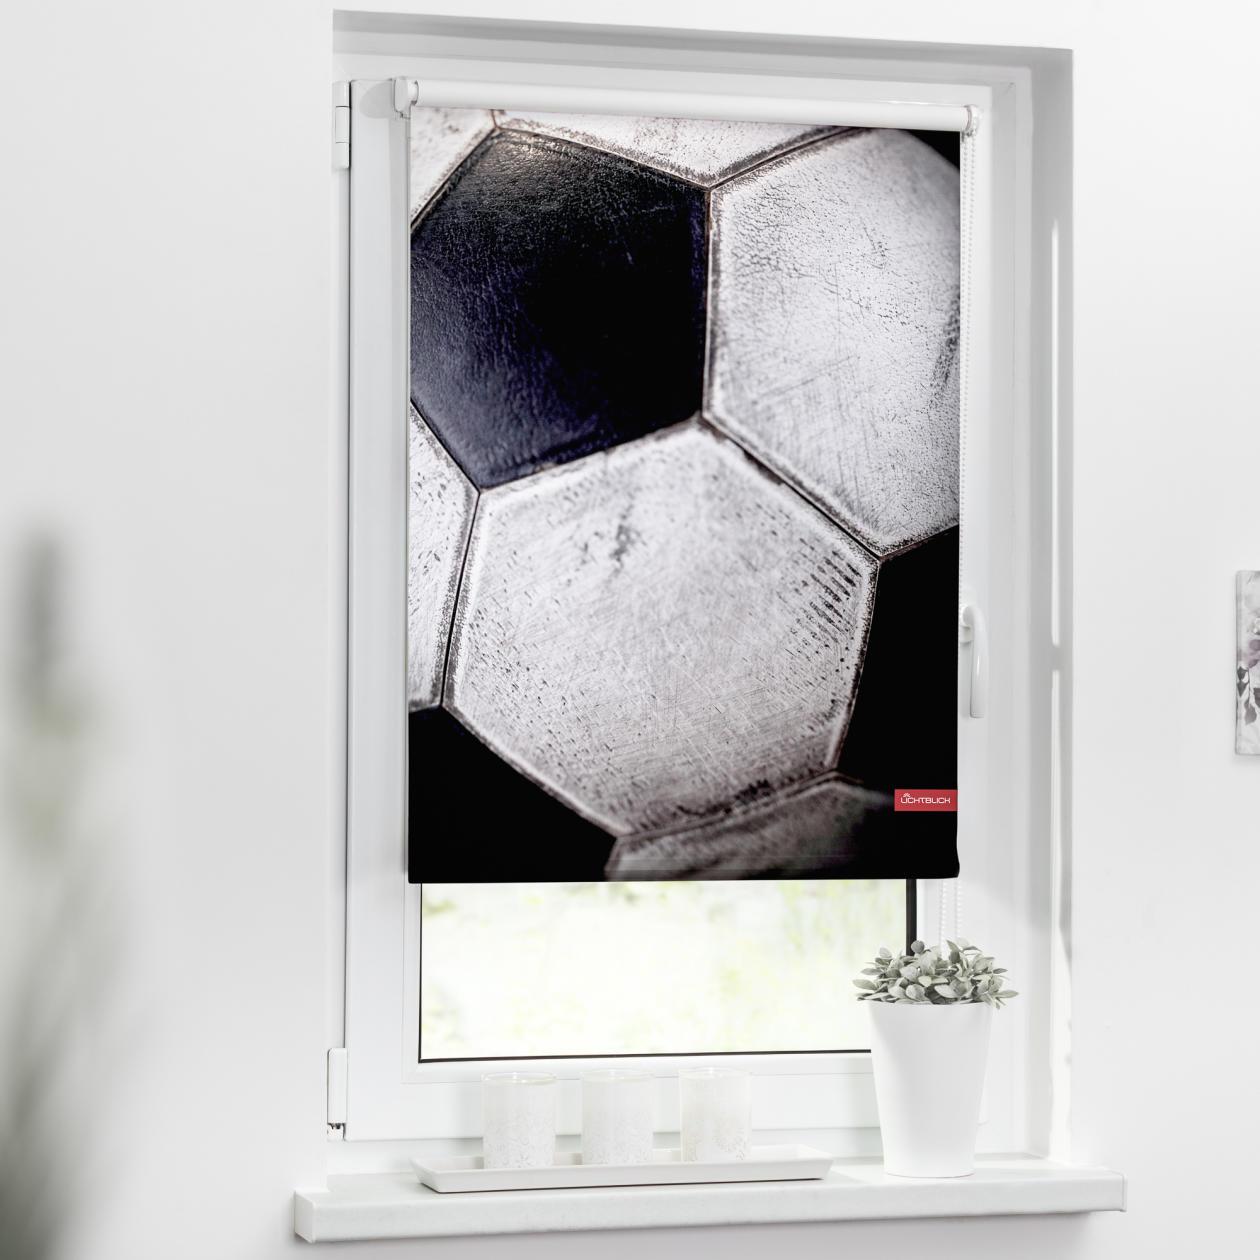 verdunkelungsrollo klemmfix ohne bohren retro fu ball schwarz wei lichblick shop. Black Bedroom Furniture Sets. Home Design Ideas